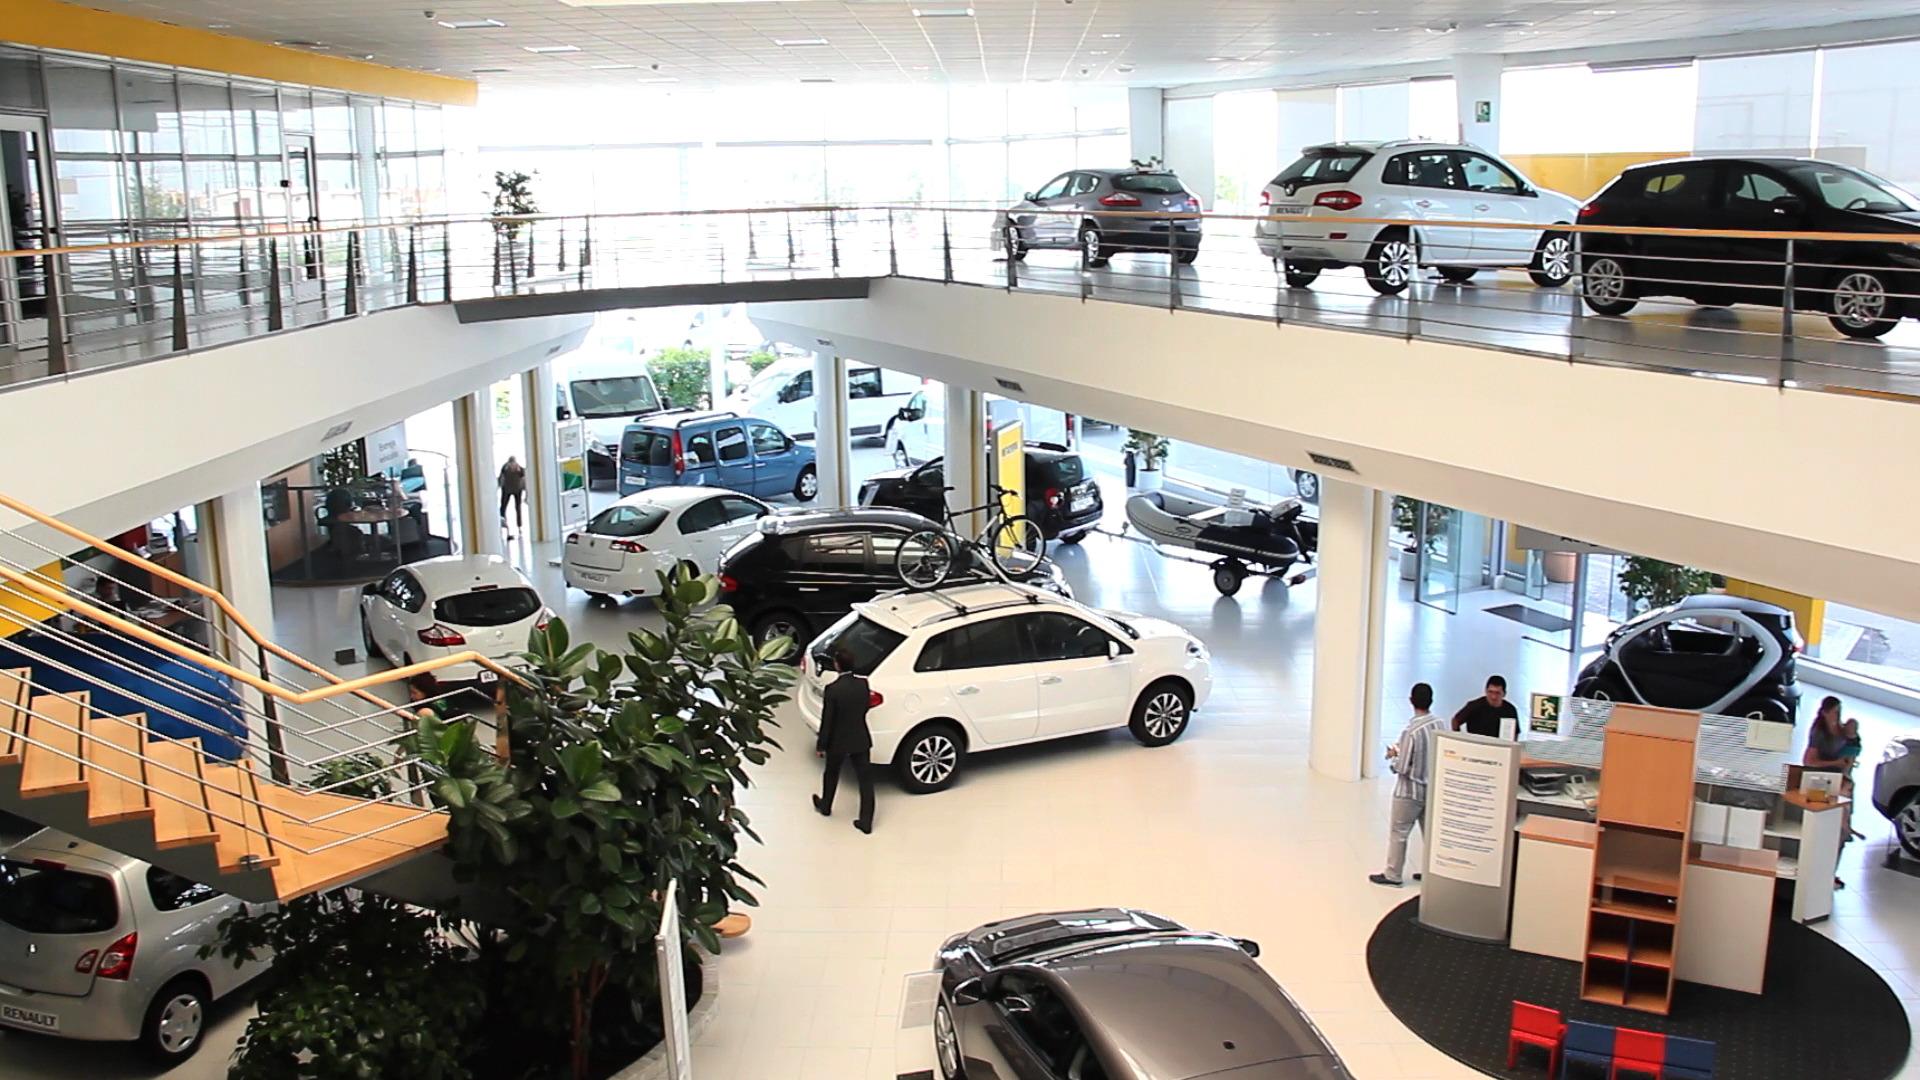 El tradicional modelo de comprador de coches en España